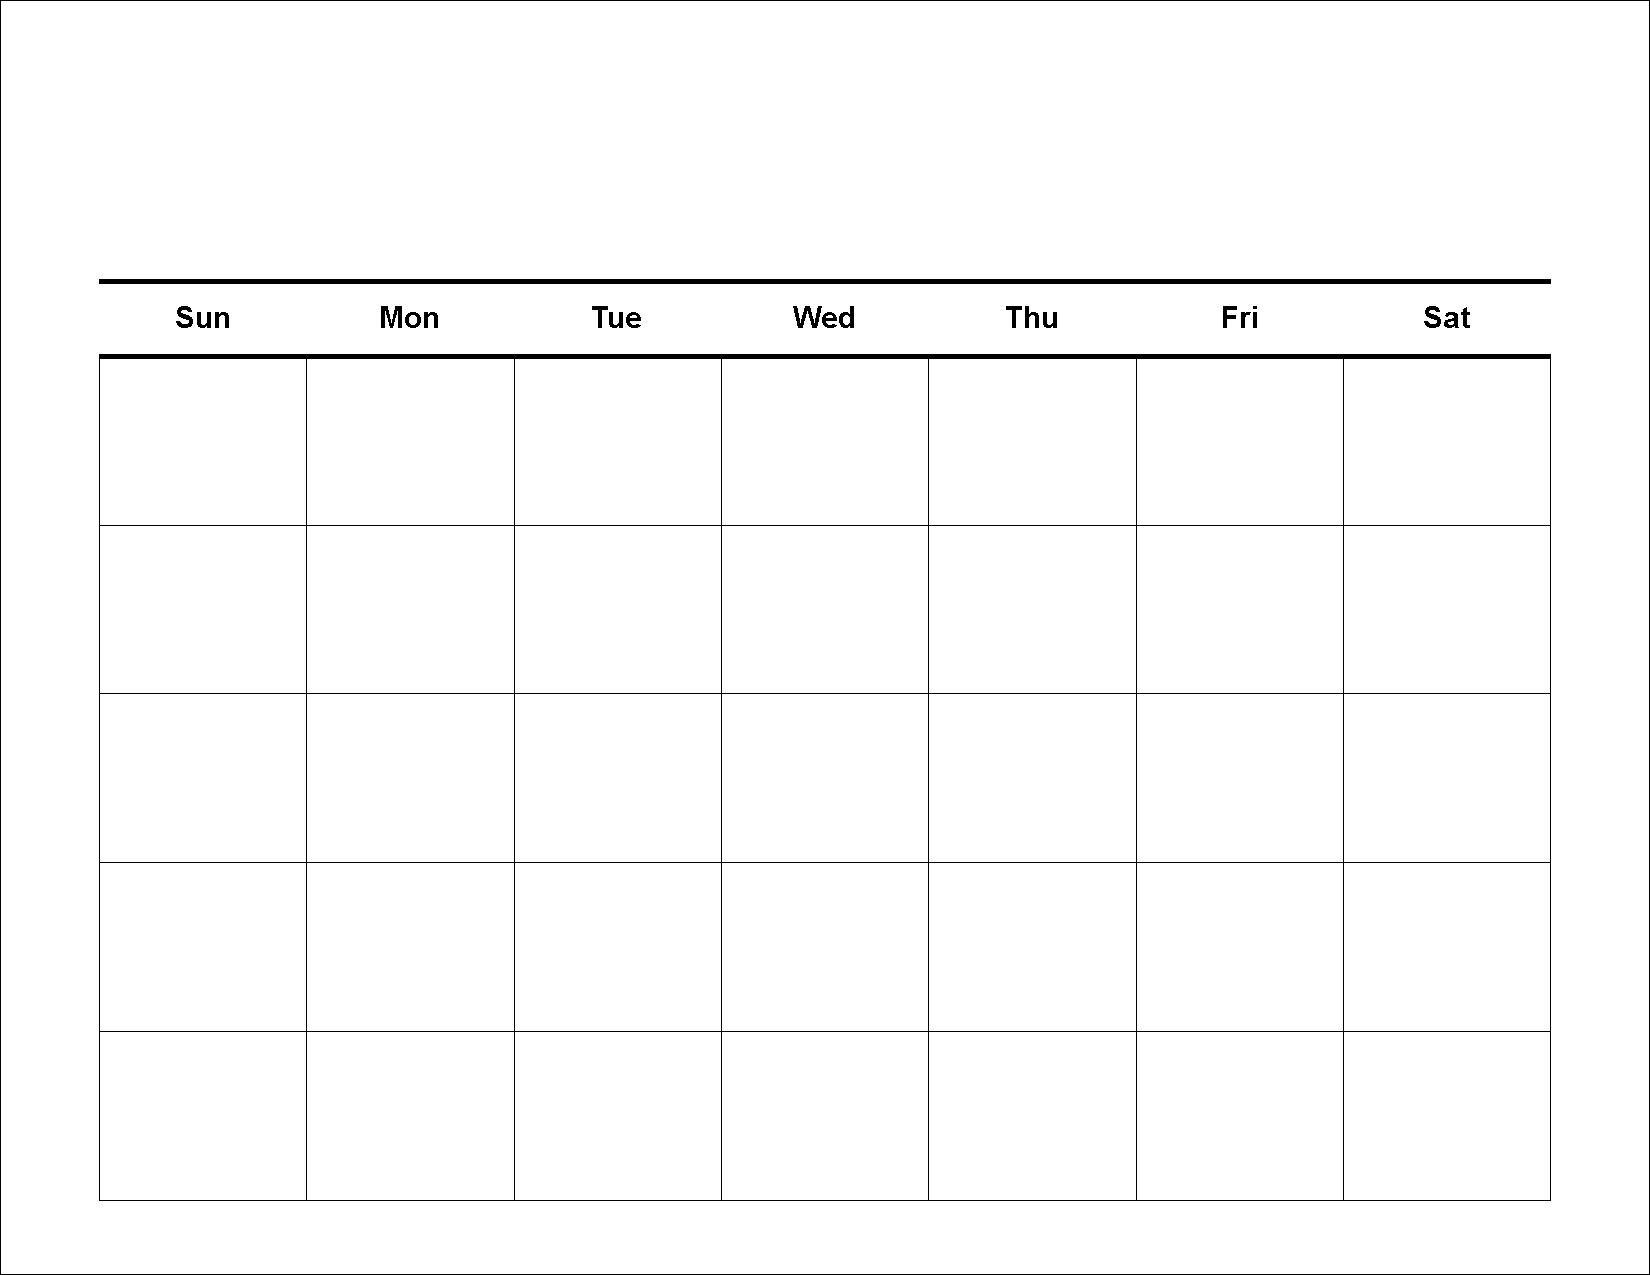 Printable Calendar Large Squares | Printable Calendar 2019 inside Large Blank Monthly Calendar To Fill In